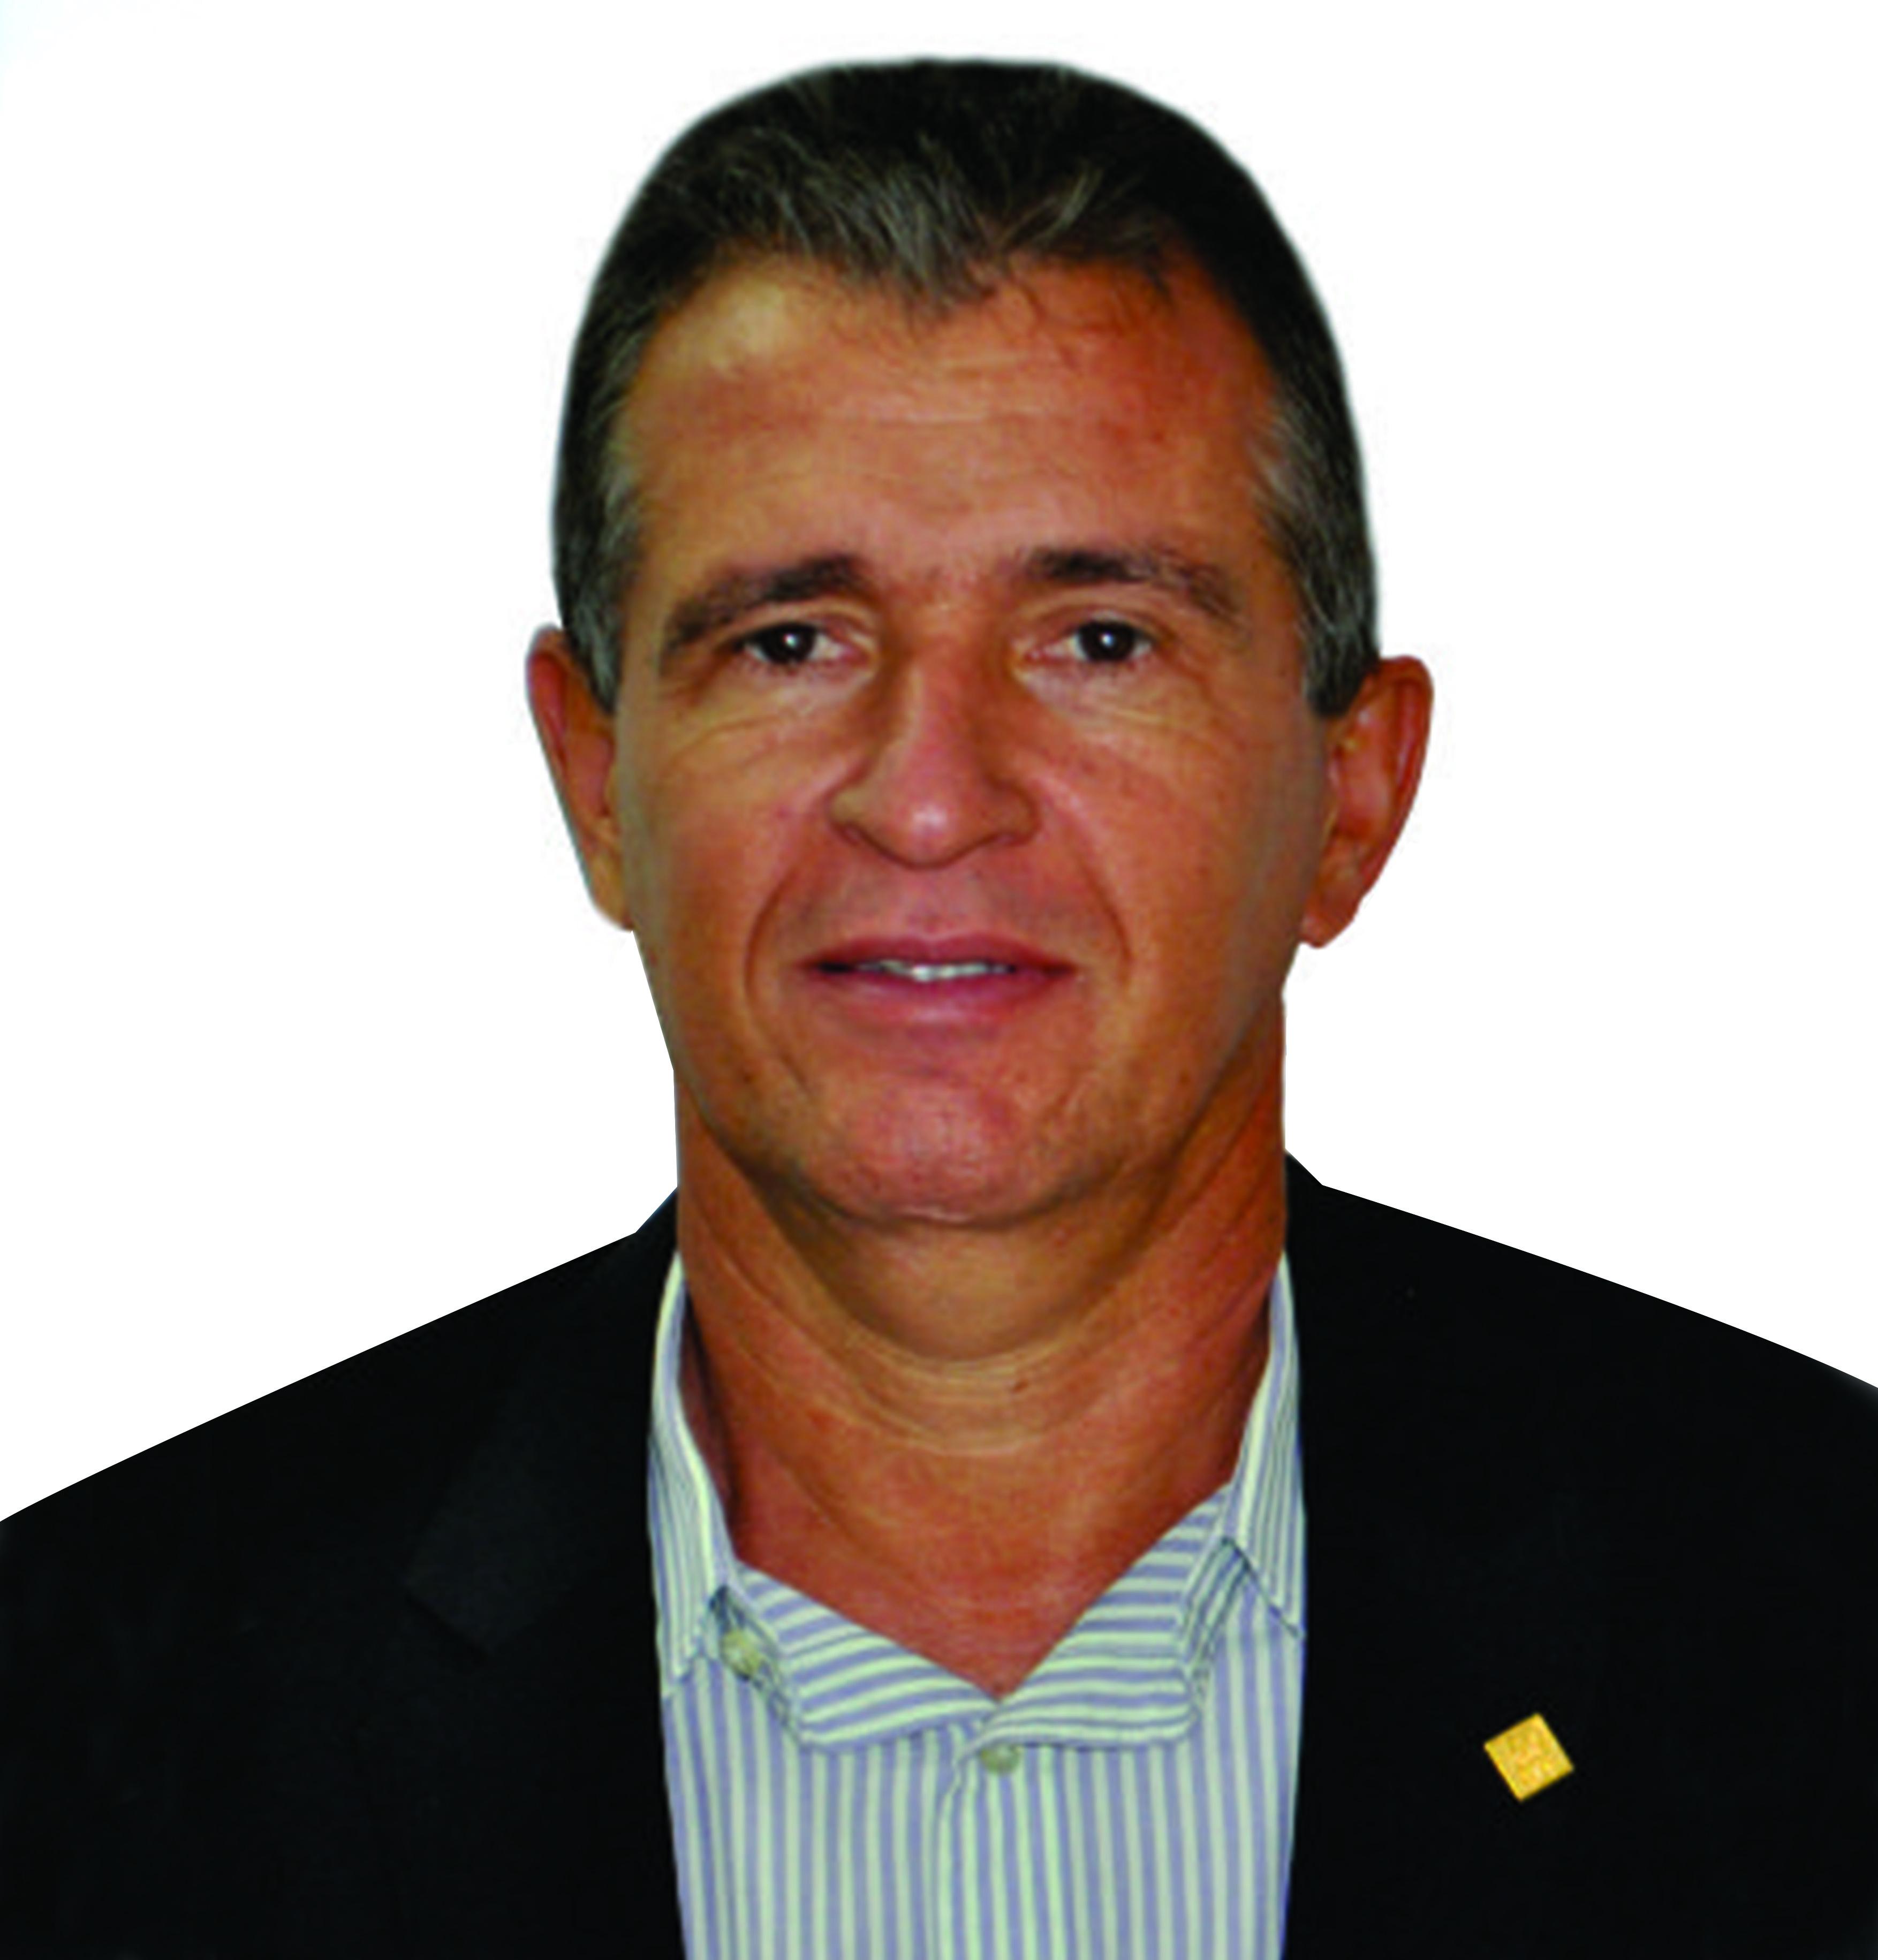 Humberto de Oliveira Miranda